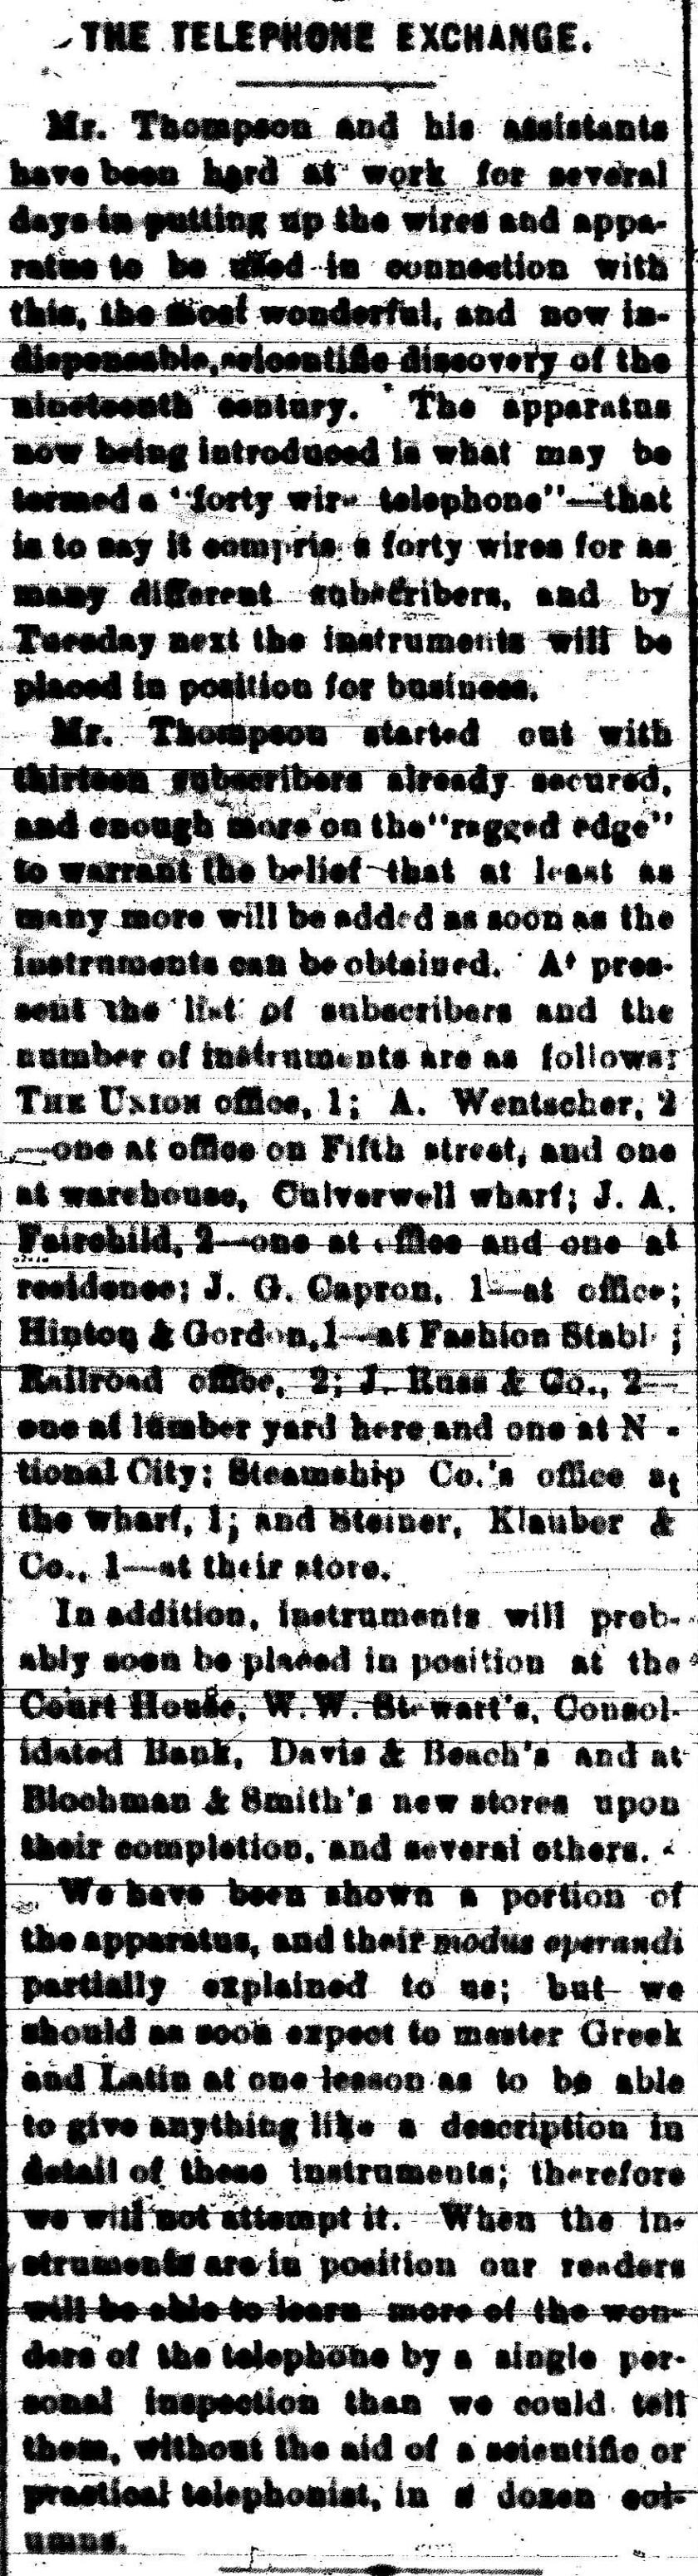 June-4-1881-telephone.jpg